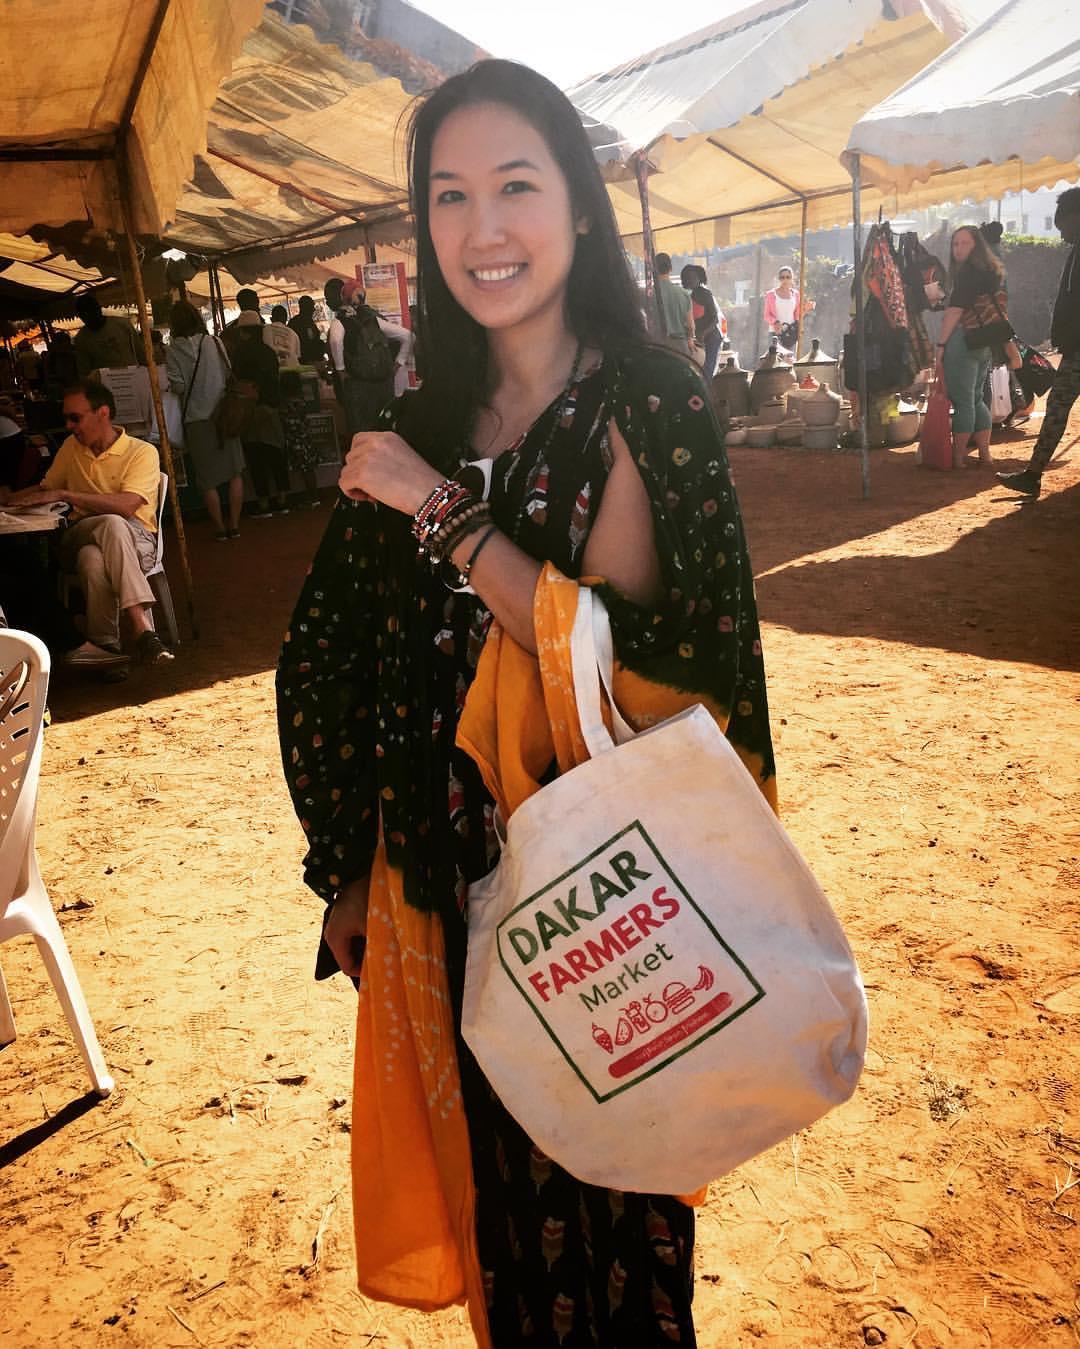 My awesome    Dakar Farmers Market    souvenir canvas tote bag.